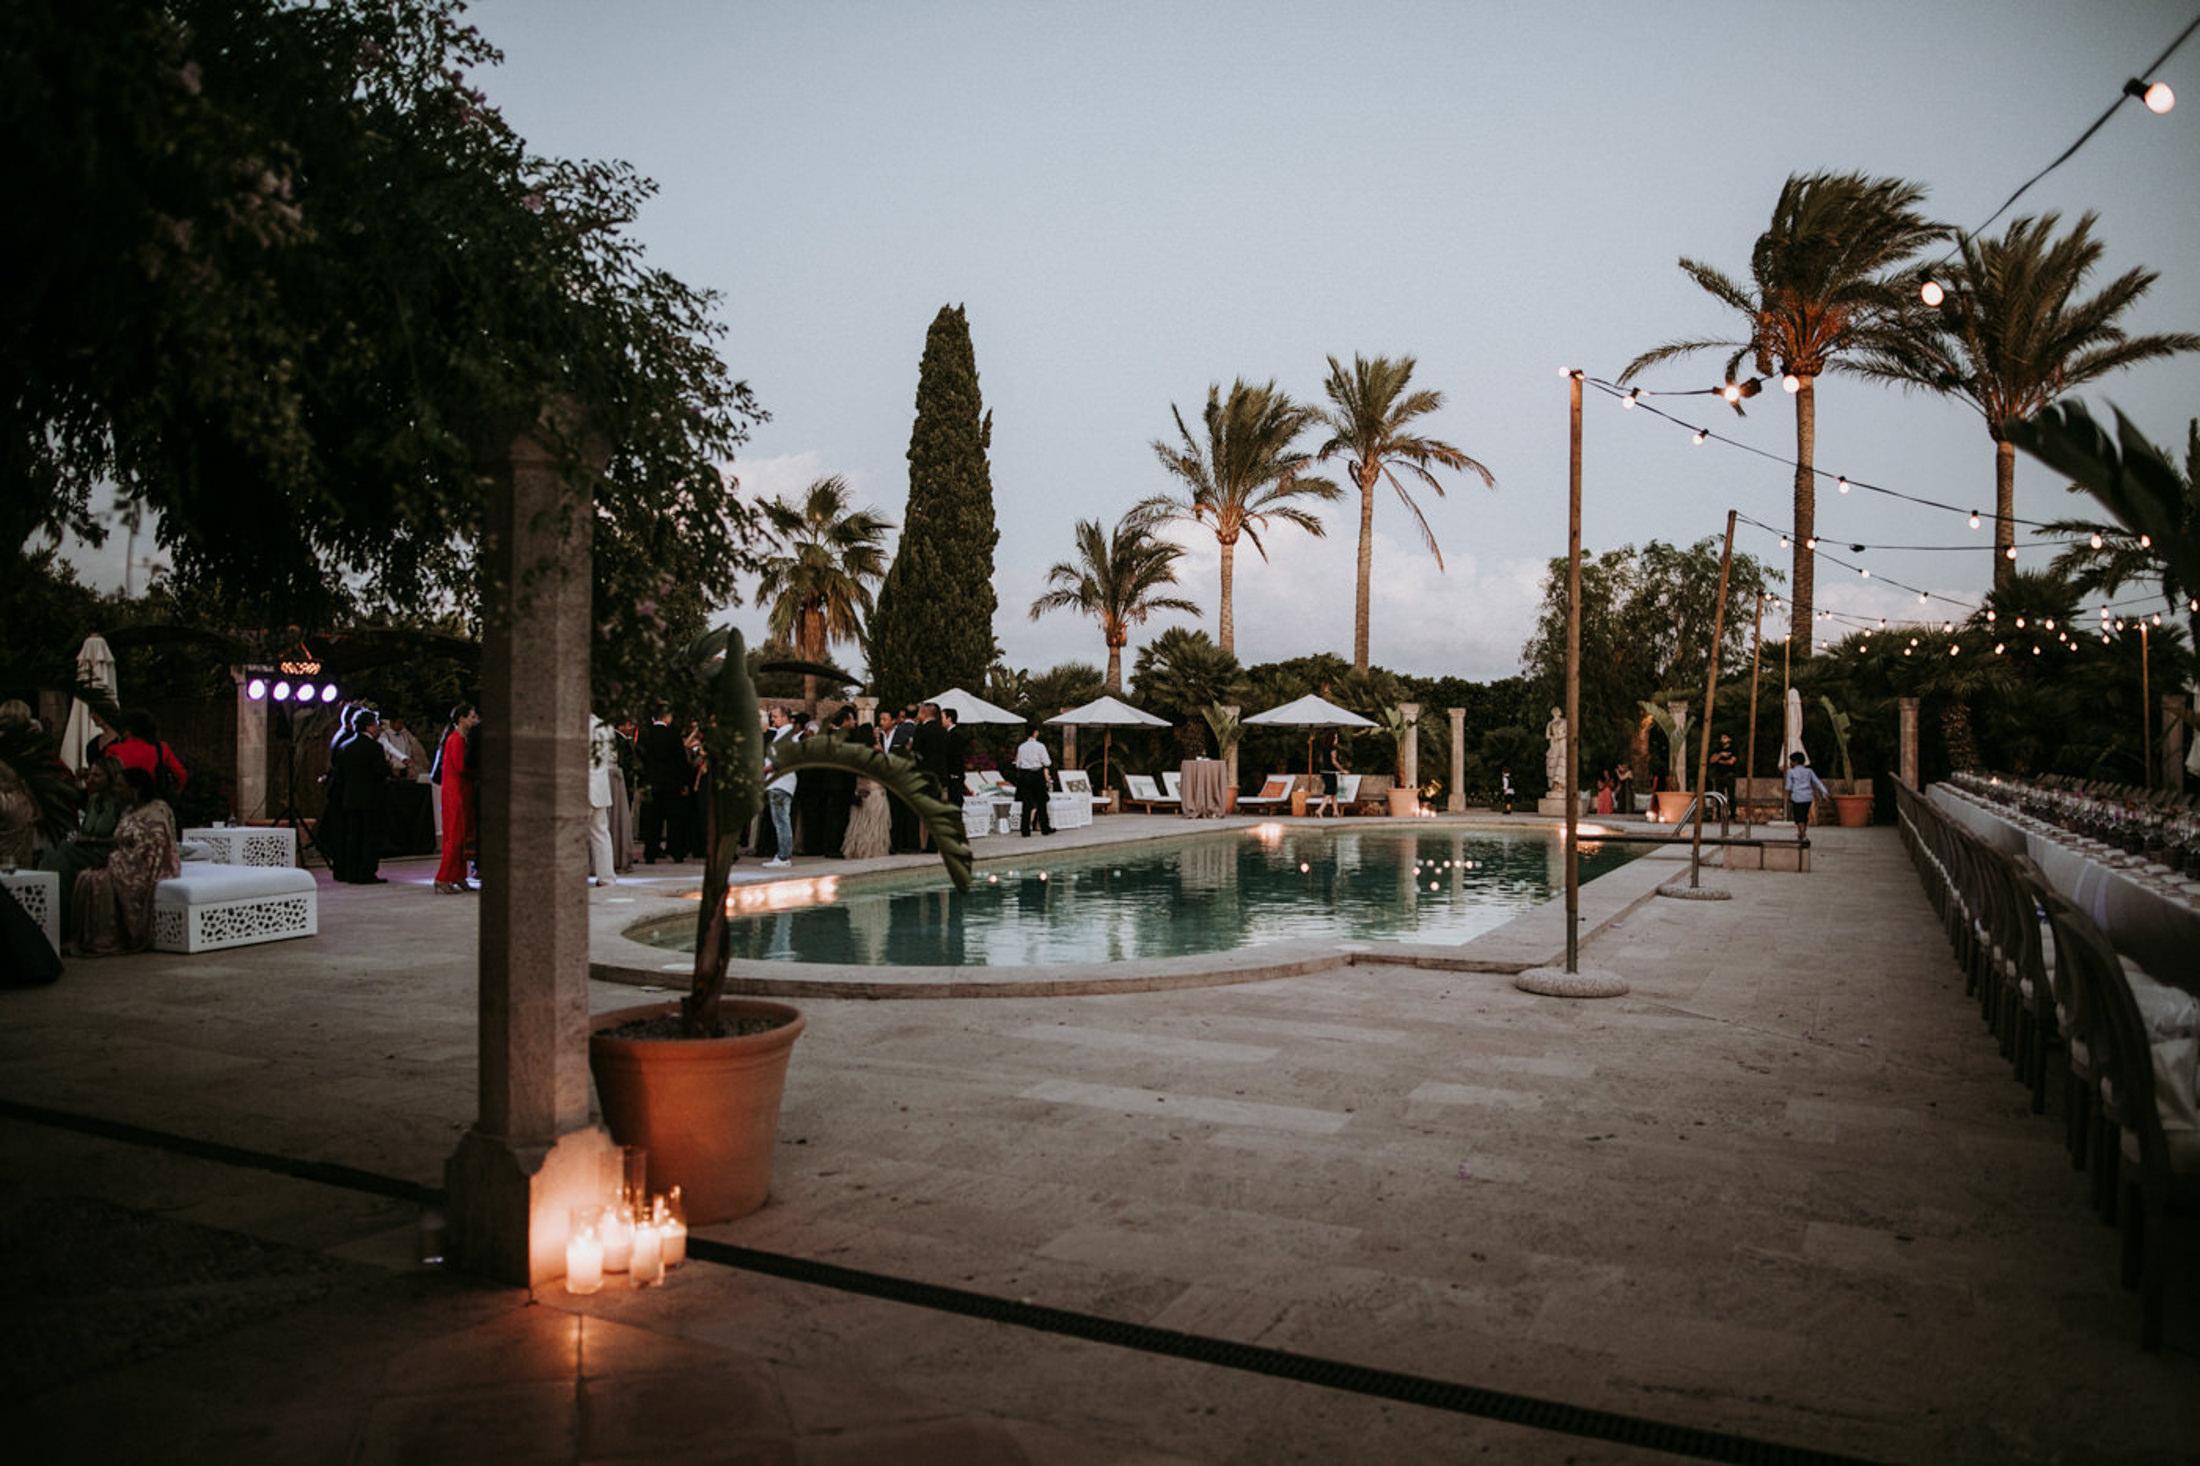 Wedding_Photographer_Mallorca_Daniela-Marquardt_Photography_New_York_Iceland_Tuscany_Santorini_Portugal_Austria_Bavaria_Elopement_Hochzeitsfotograf_AntjeRajat2_104